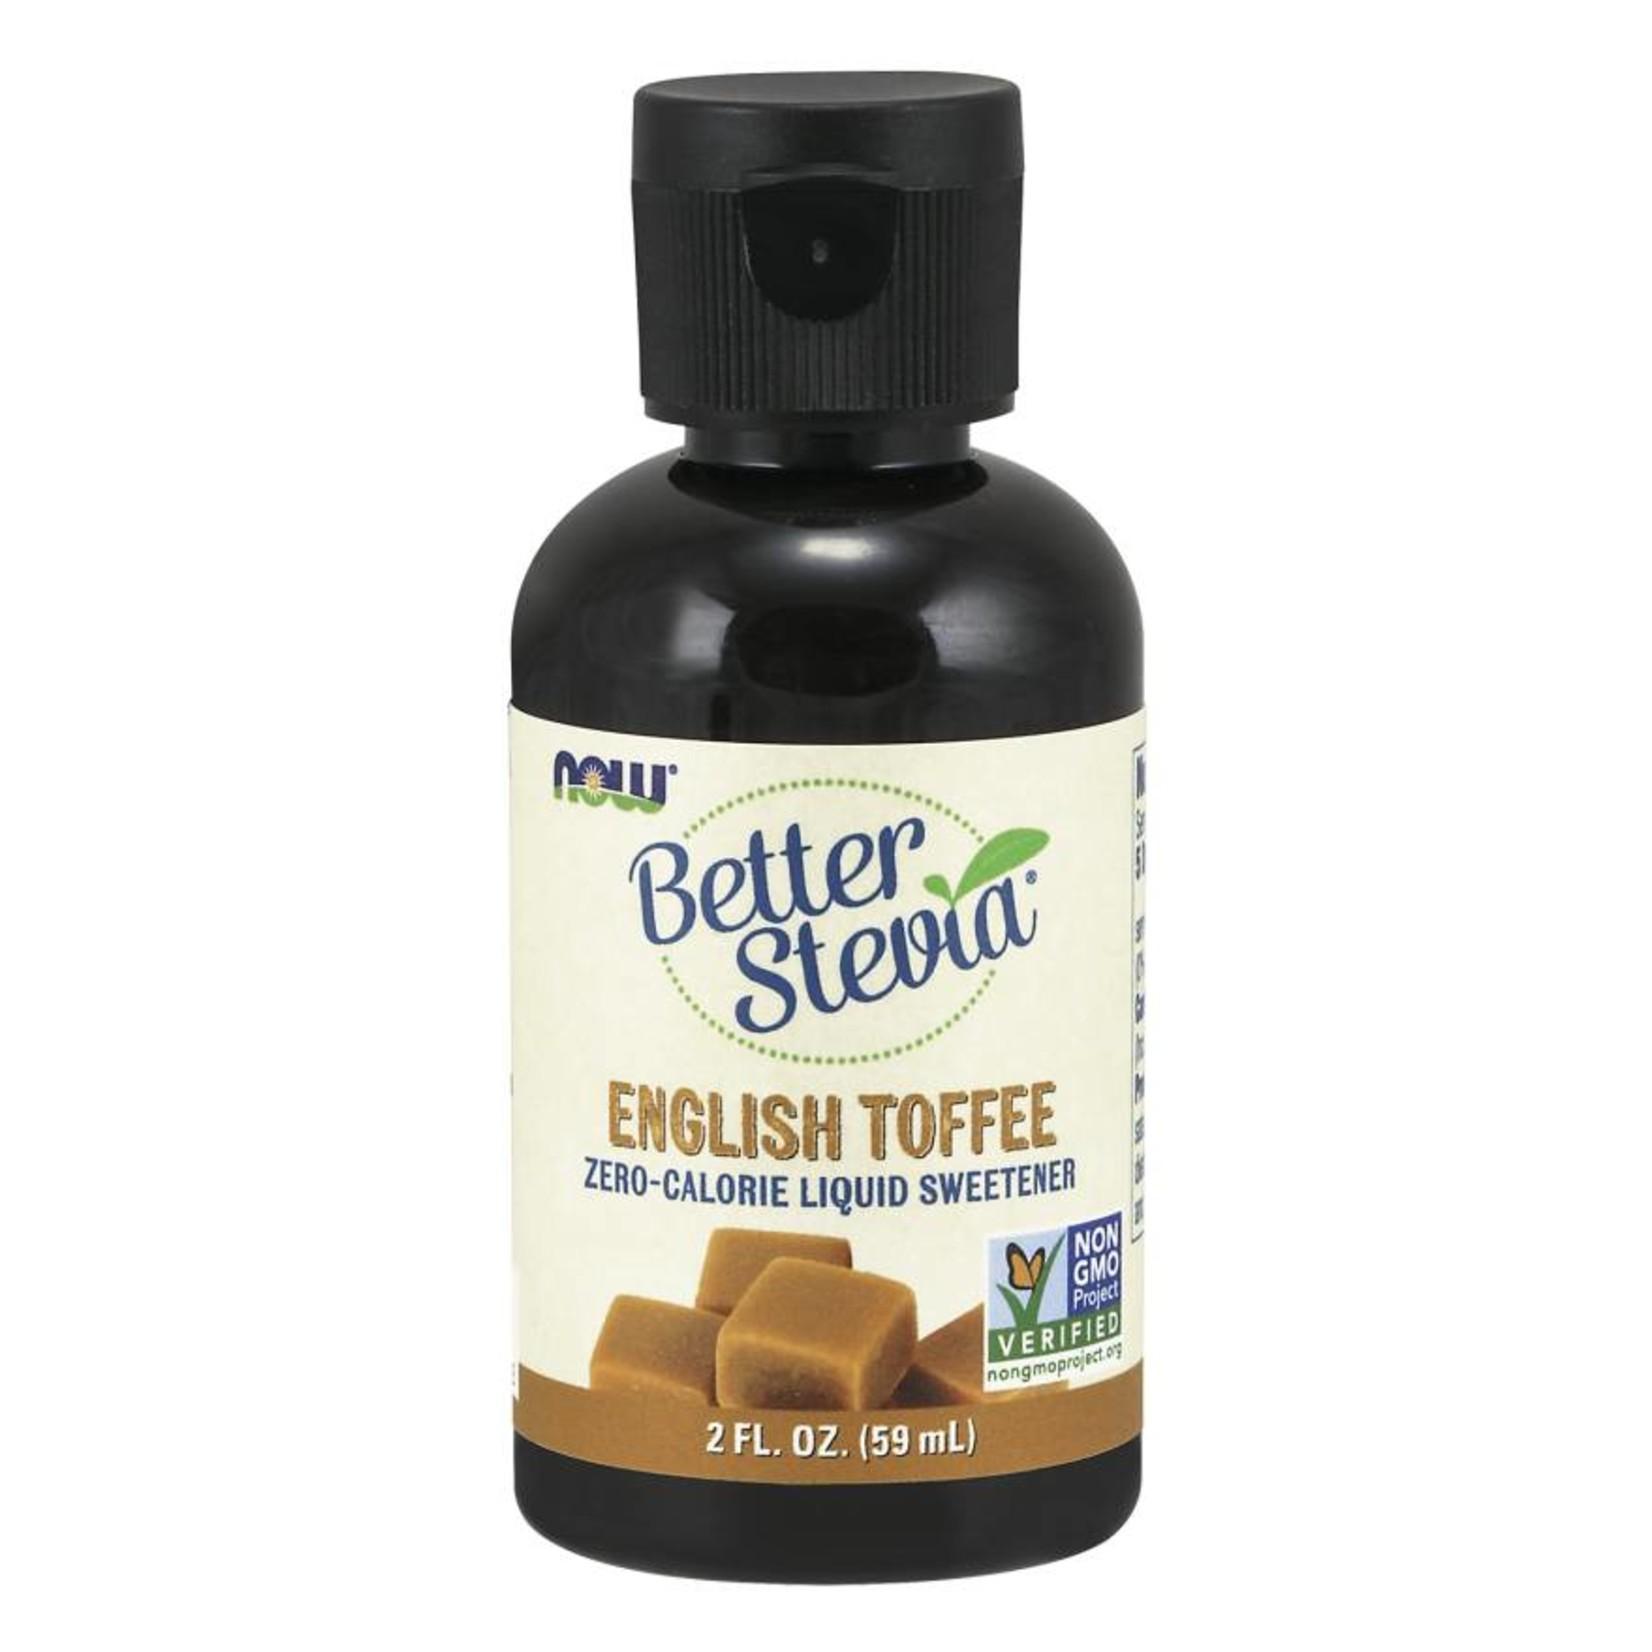 NOW NOW Better Stevia Liquid Sweetener- English Toffee 60ml